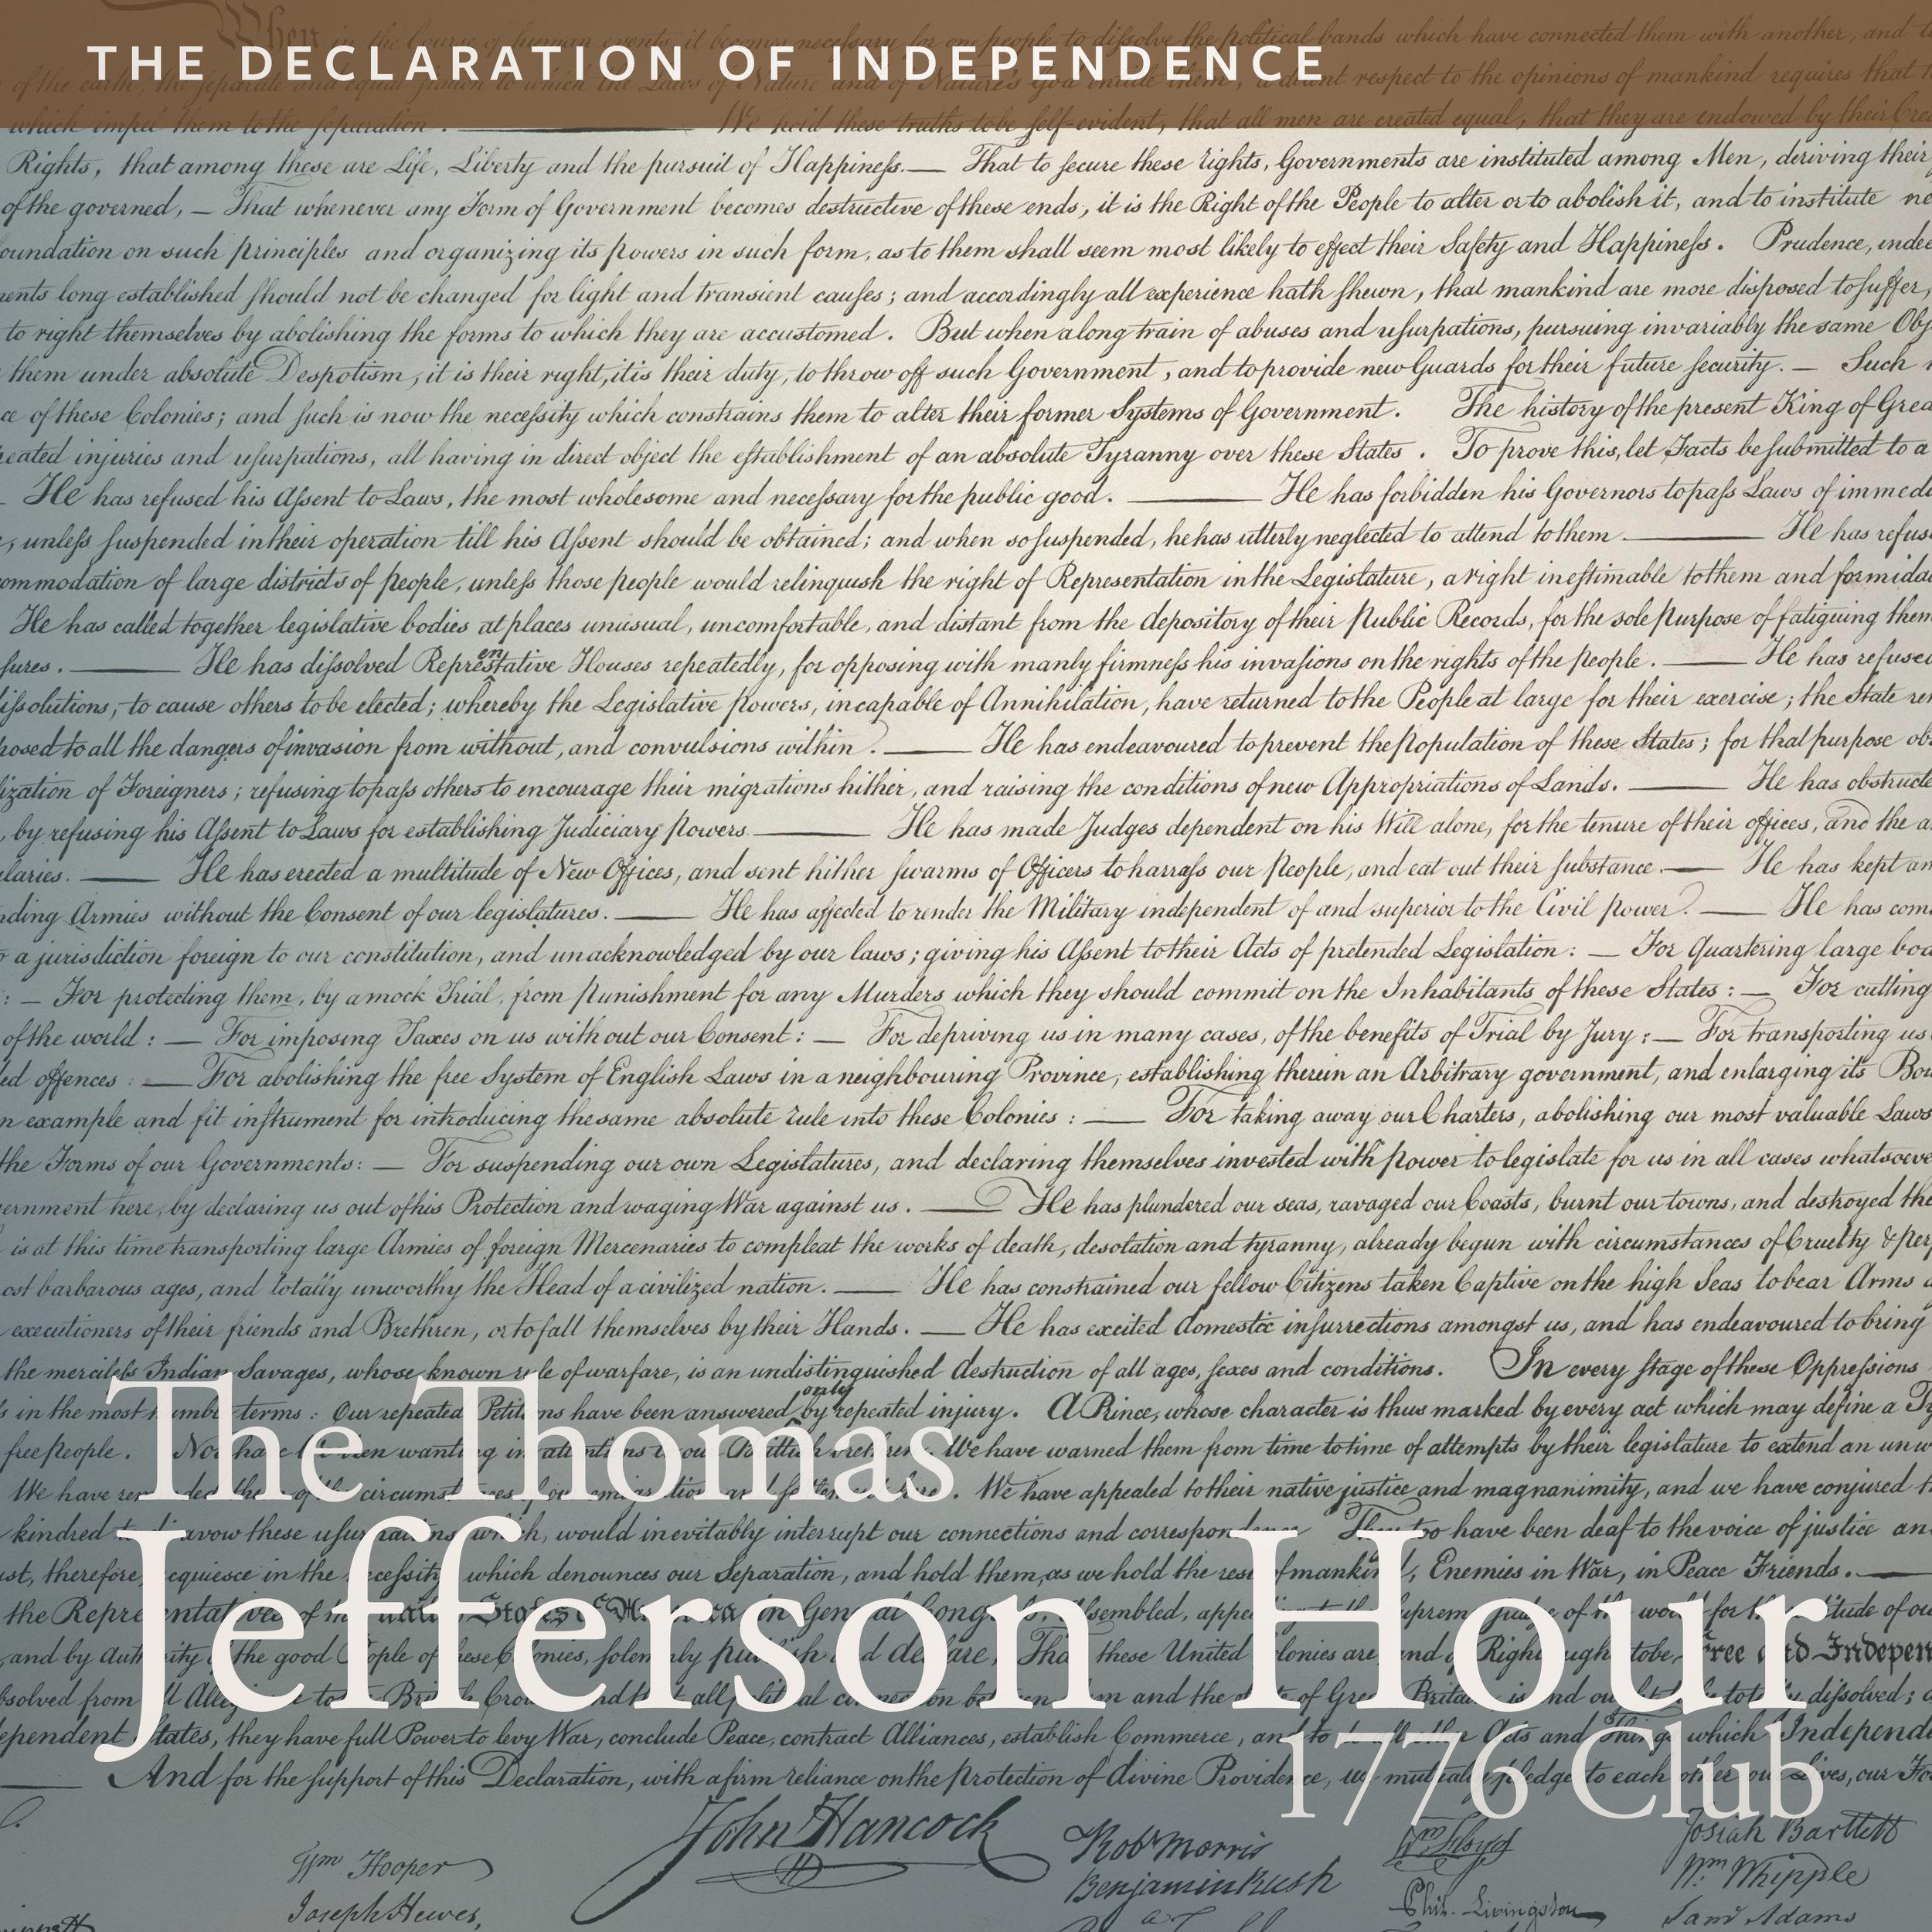 037 Declaration of Independence.jpg